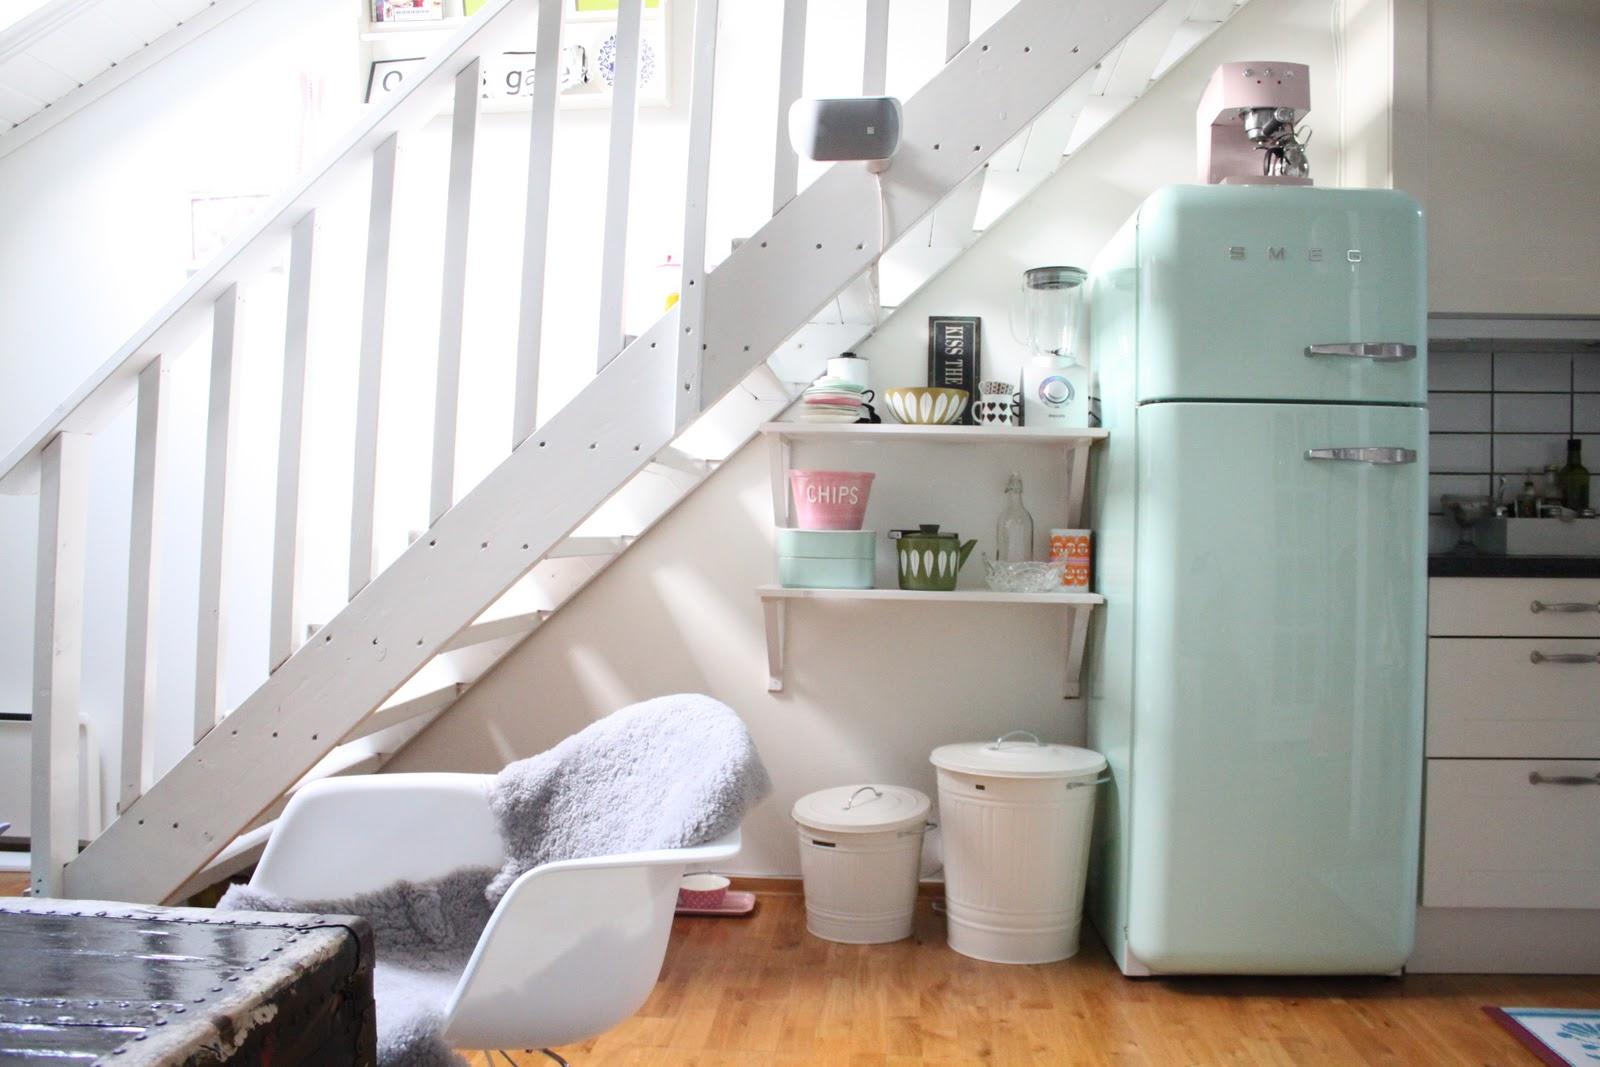 Sukkert y for yet kj kken - Cucina con frigo smeg ...